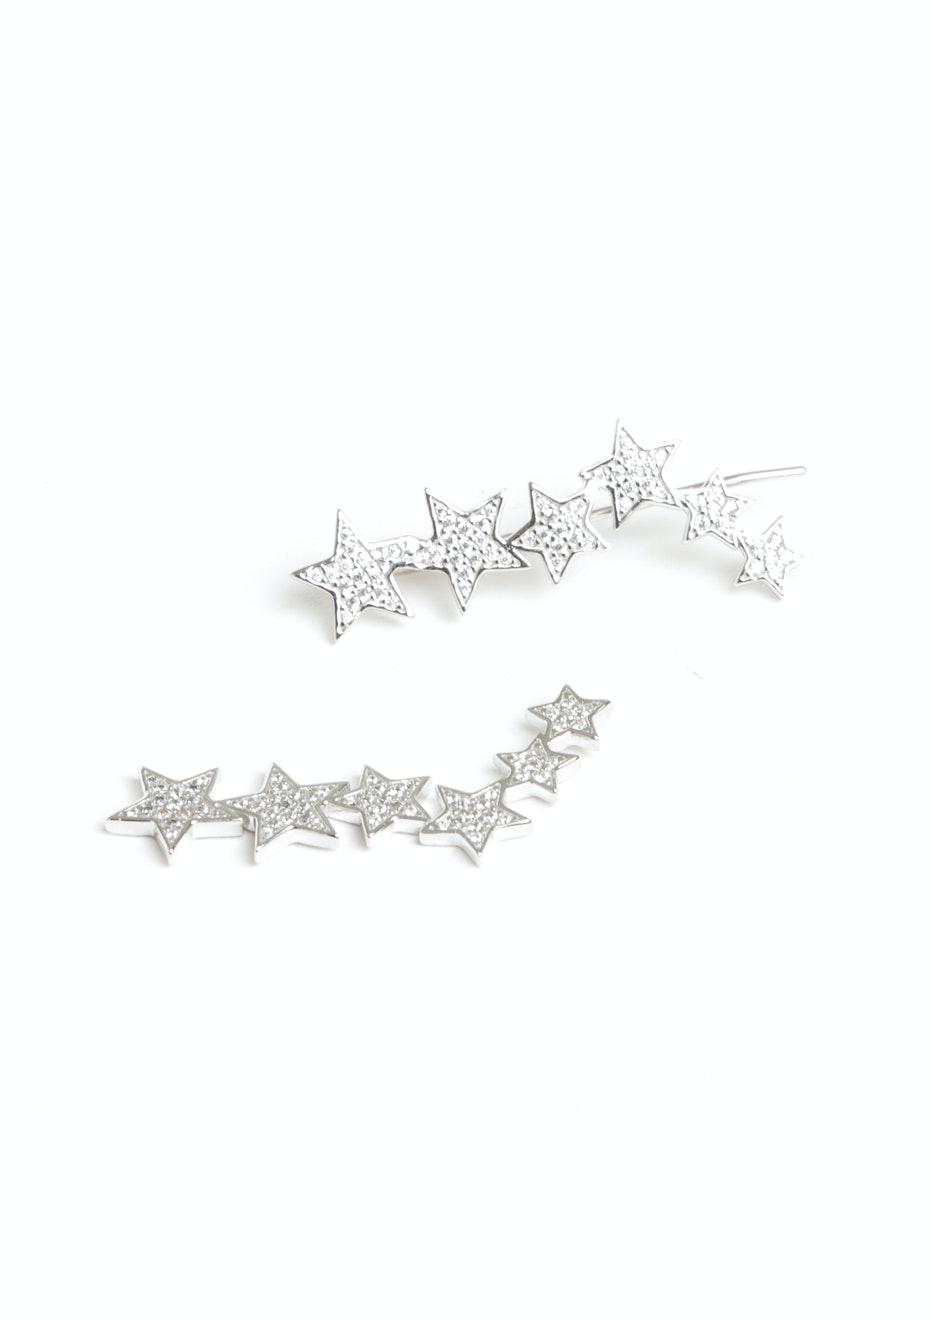 Night Sky Cuff - 925 Silver